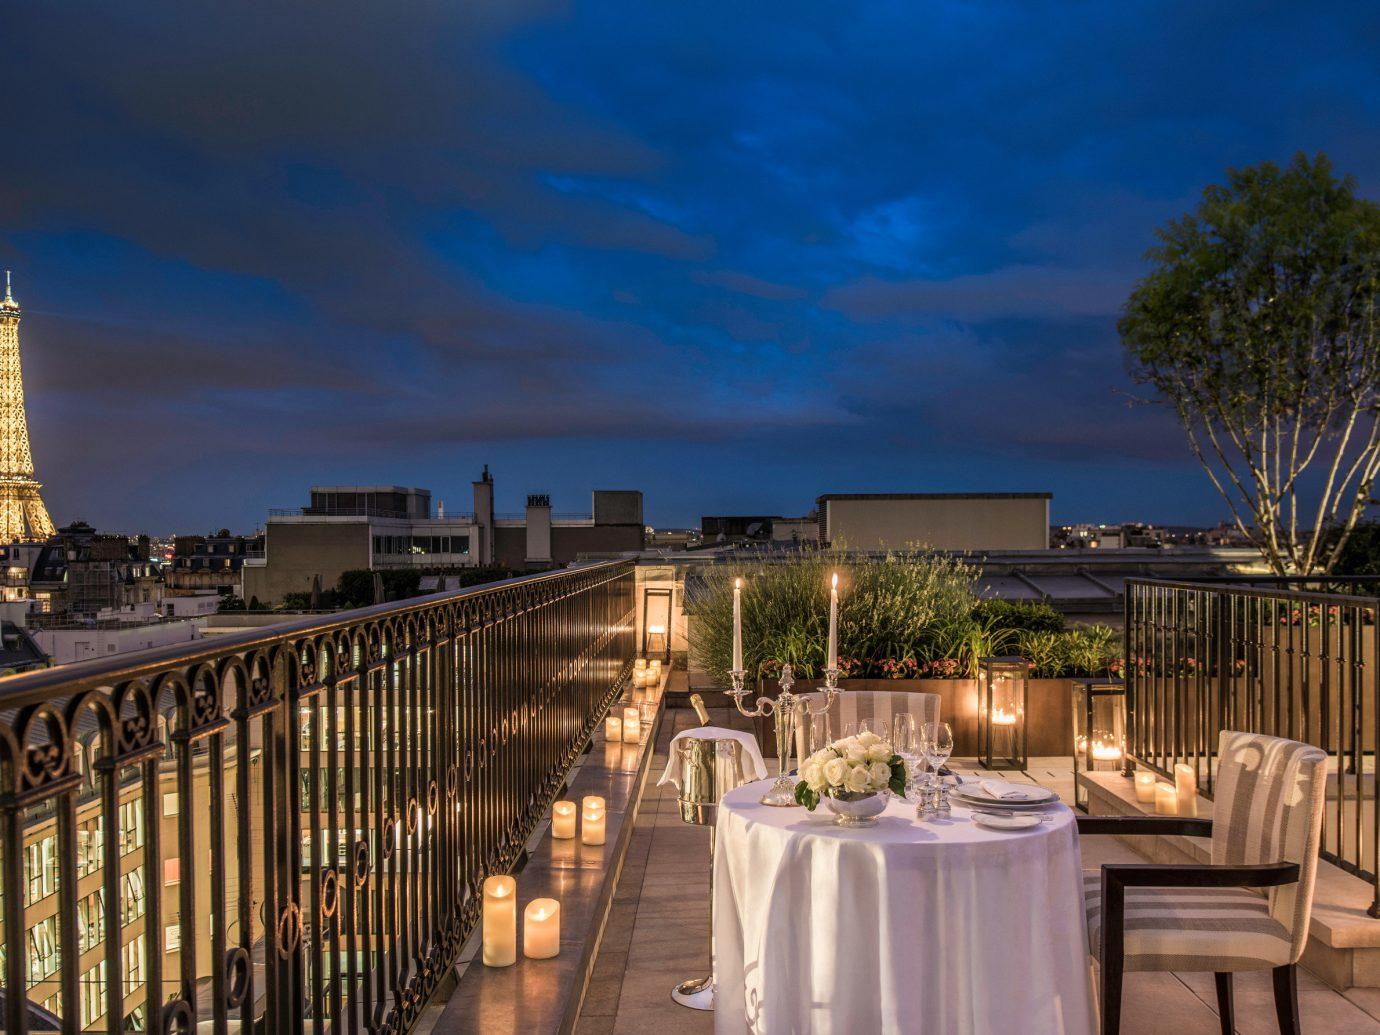 Hotels Romance sky outdoor landmark night evening estate cityscape reflection skyline dusk palace several